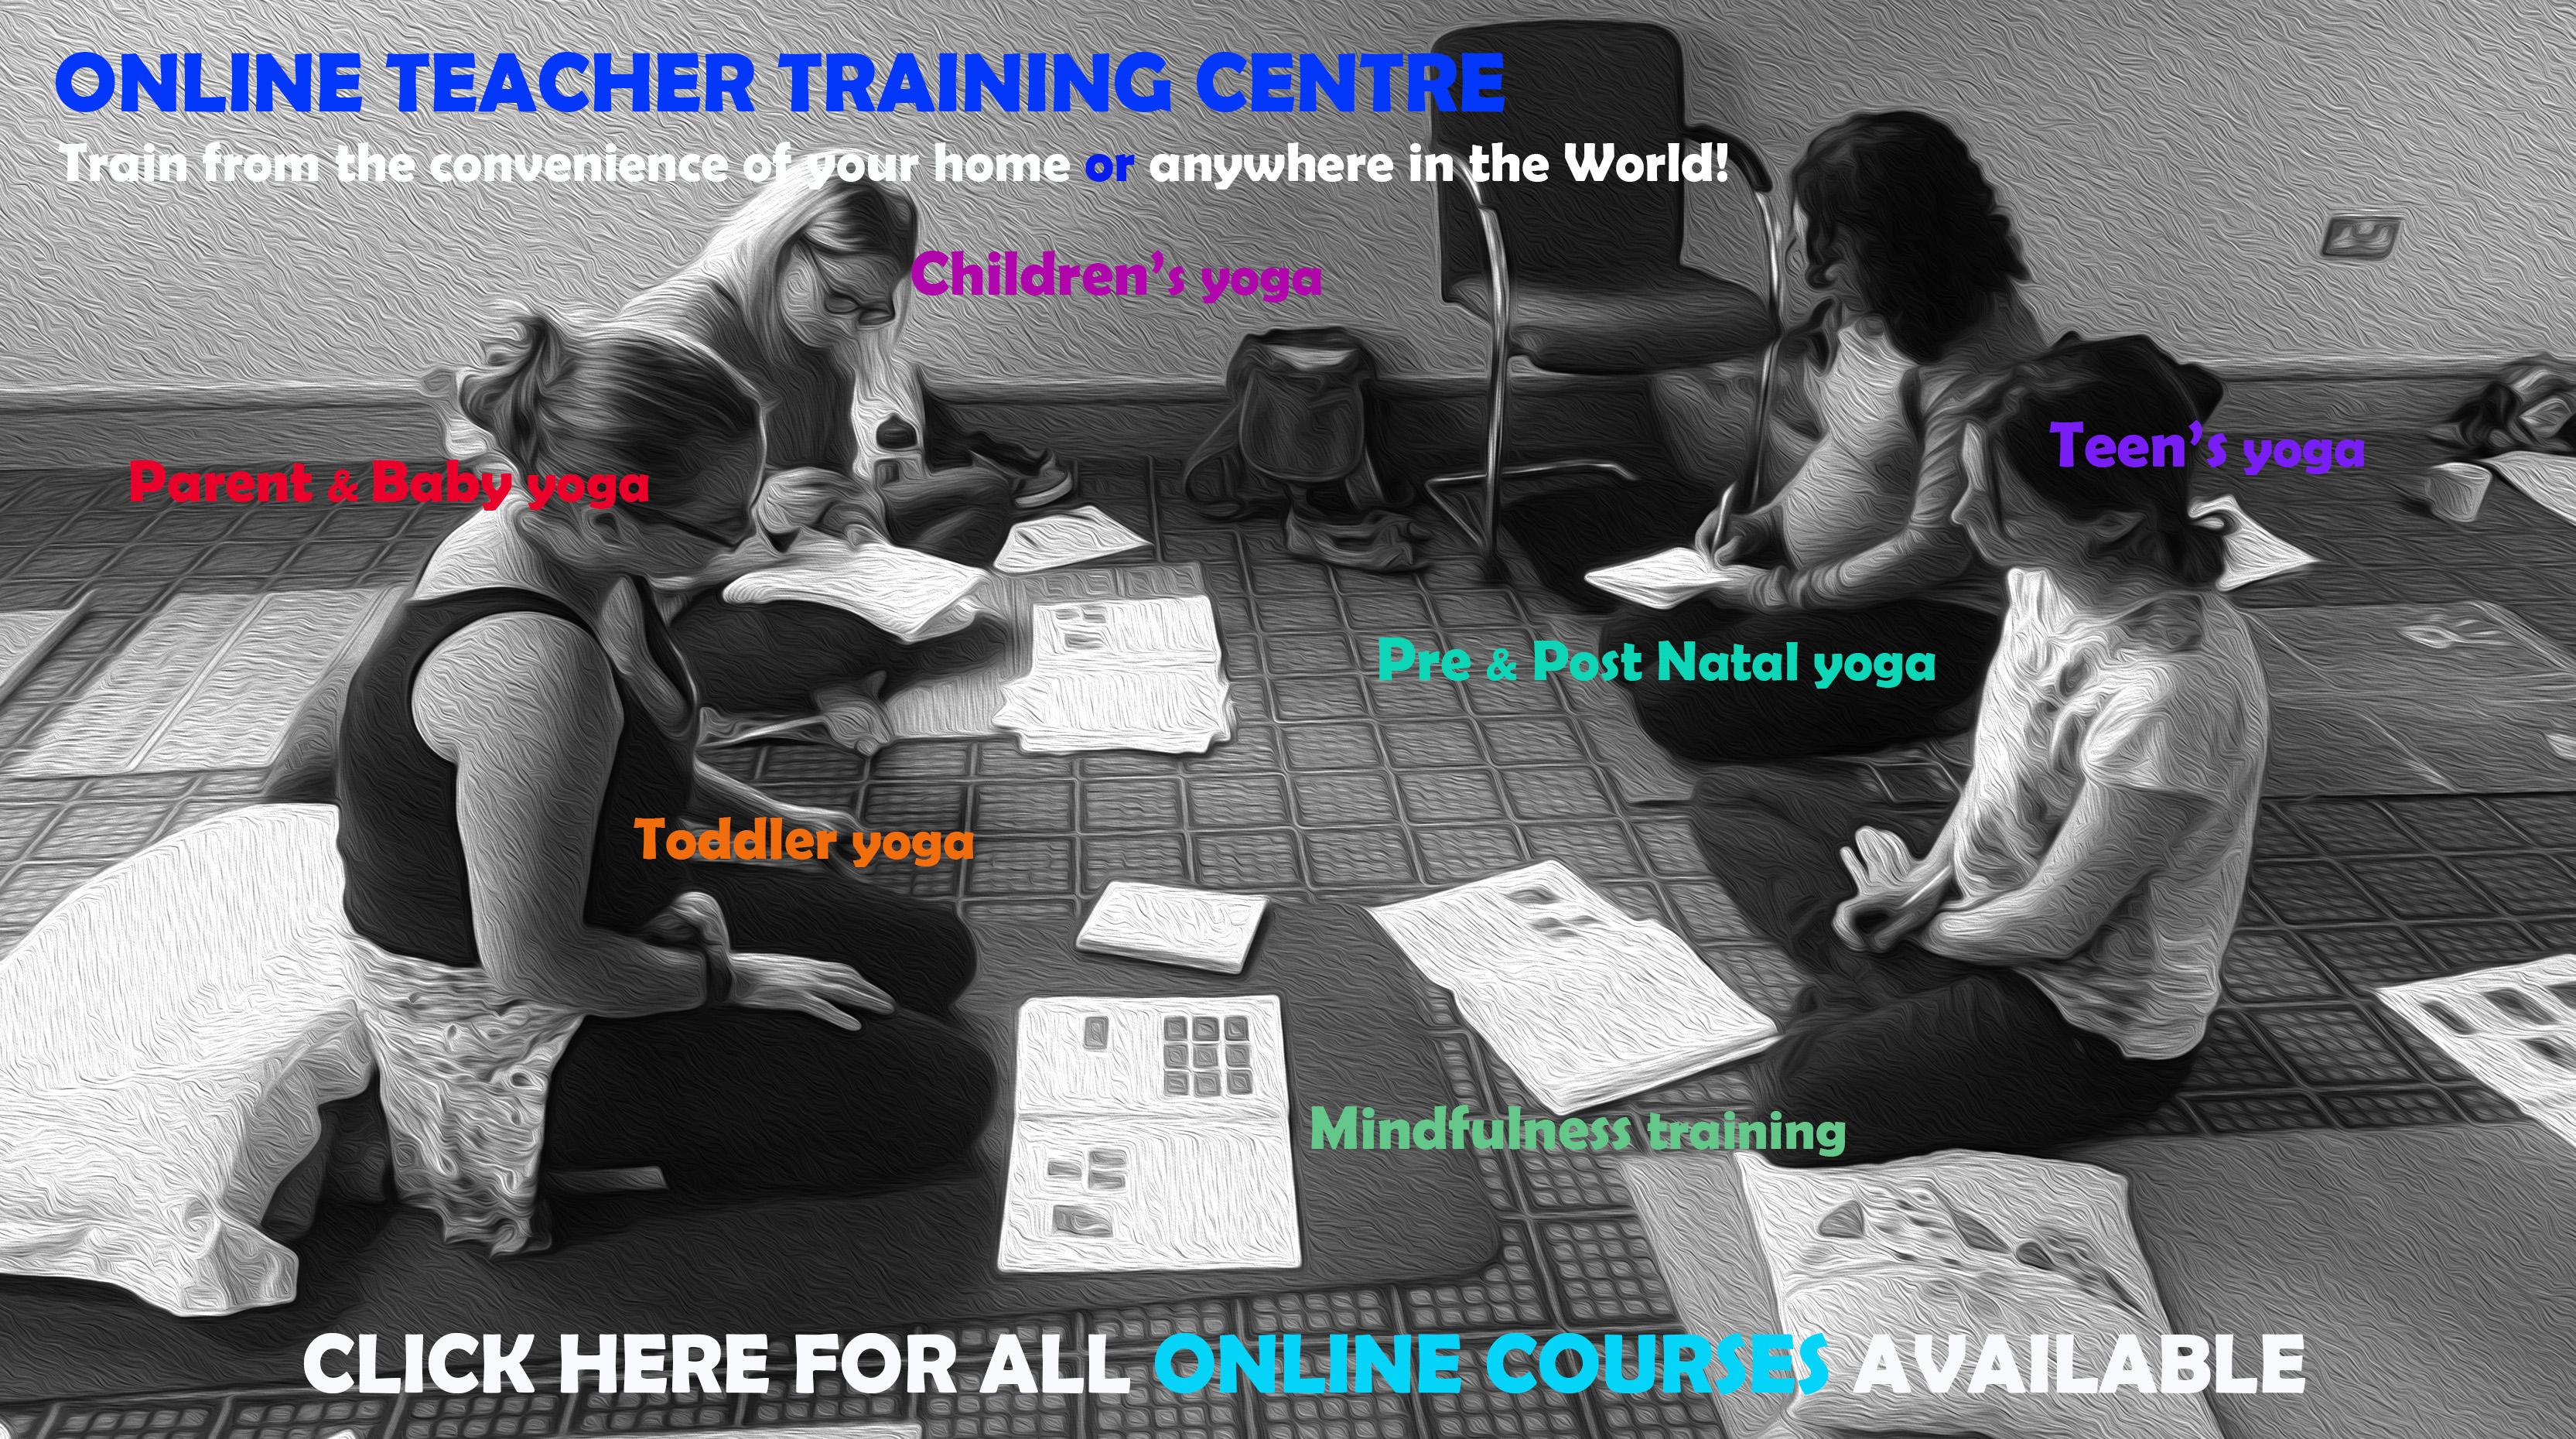 Pre and Post Natal Yoga Teacher Training – Yogakidz